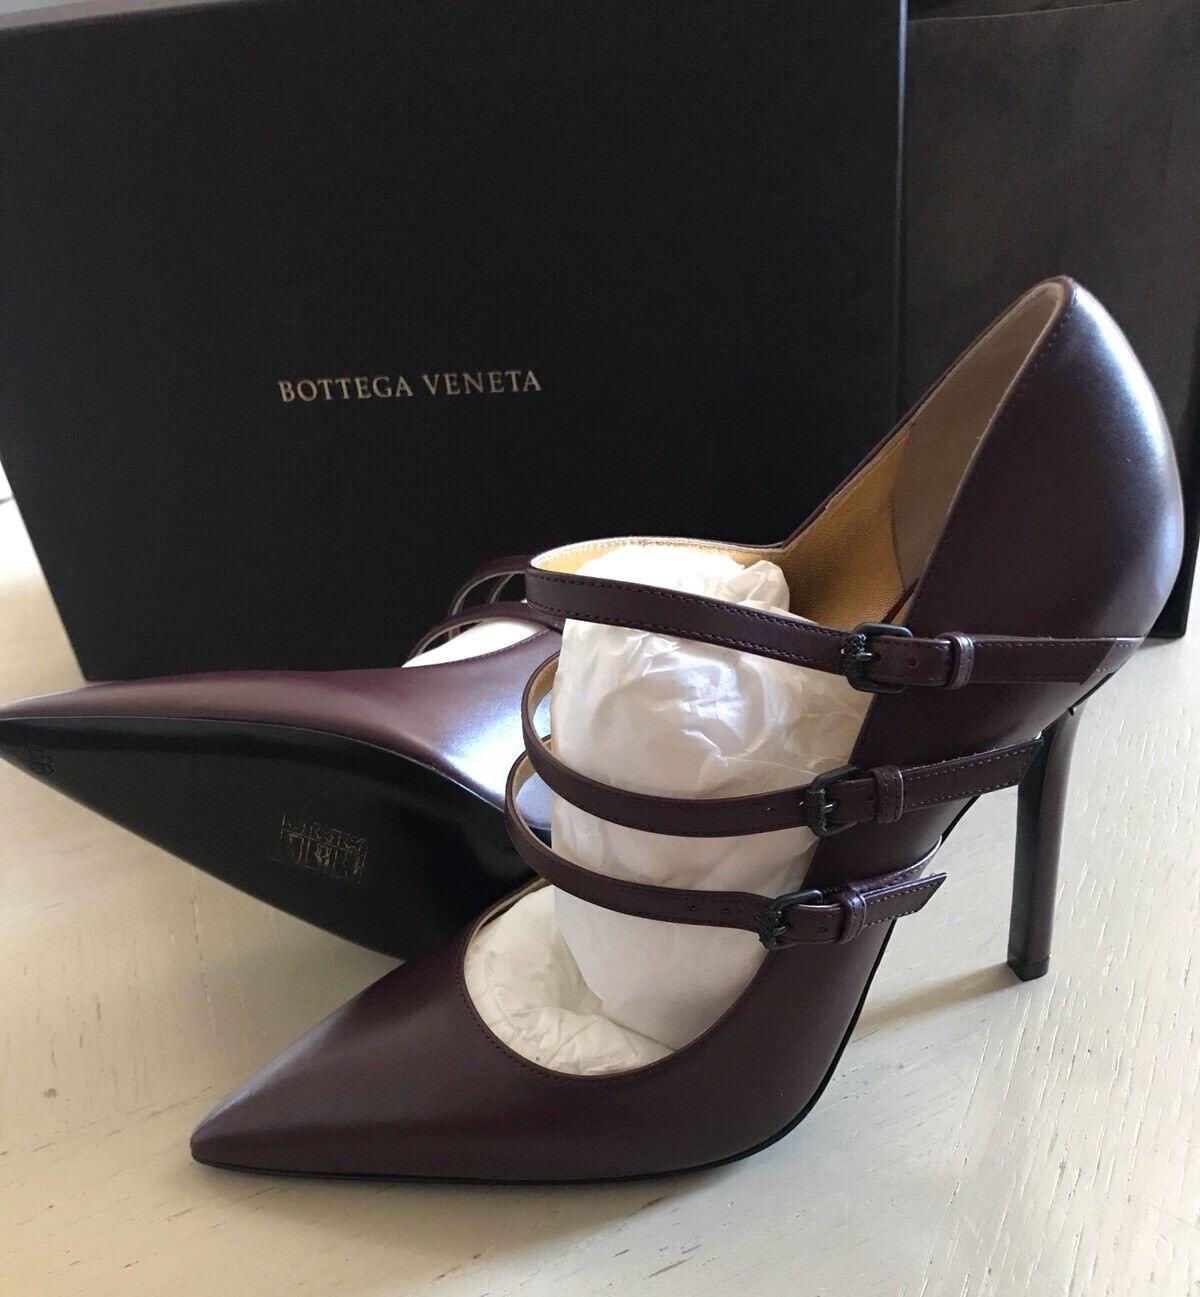 NIB  740 Bottega Veneta Donna's Leather Shoes Burgundy 8.5 US ( 38.5 Eu ) 443156